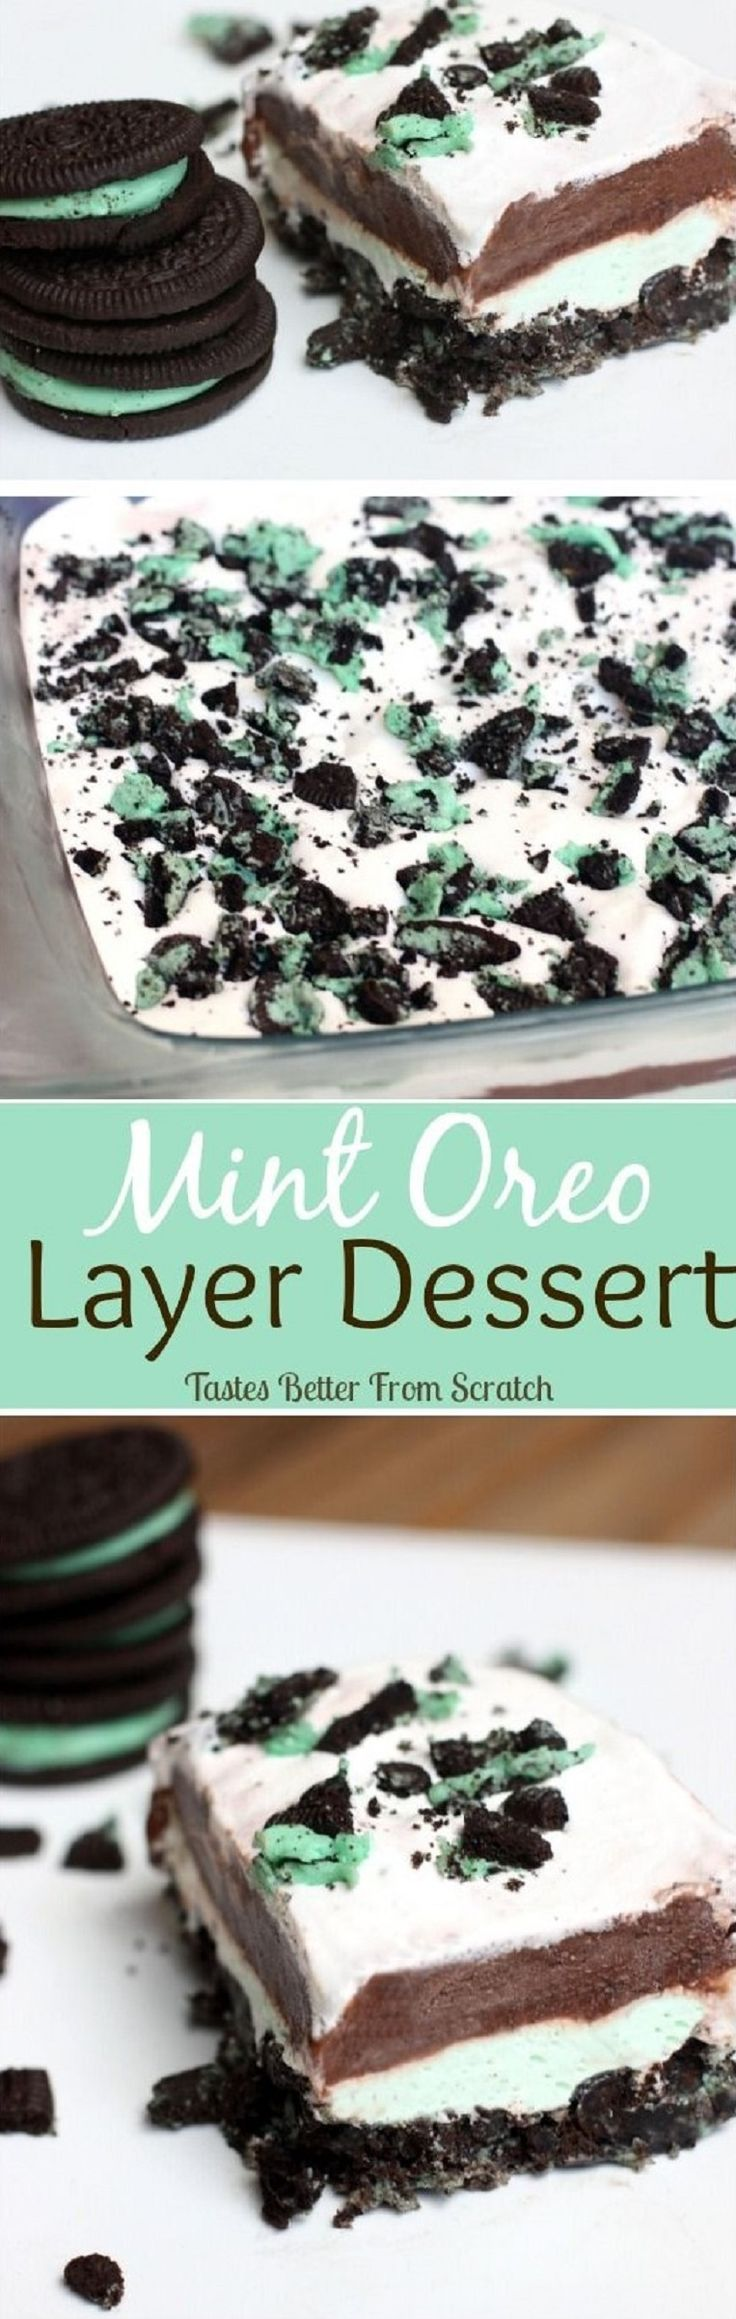 Mint Oreo Layer Dessert - 16 Divine Oreo Desserts | GleamItUp